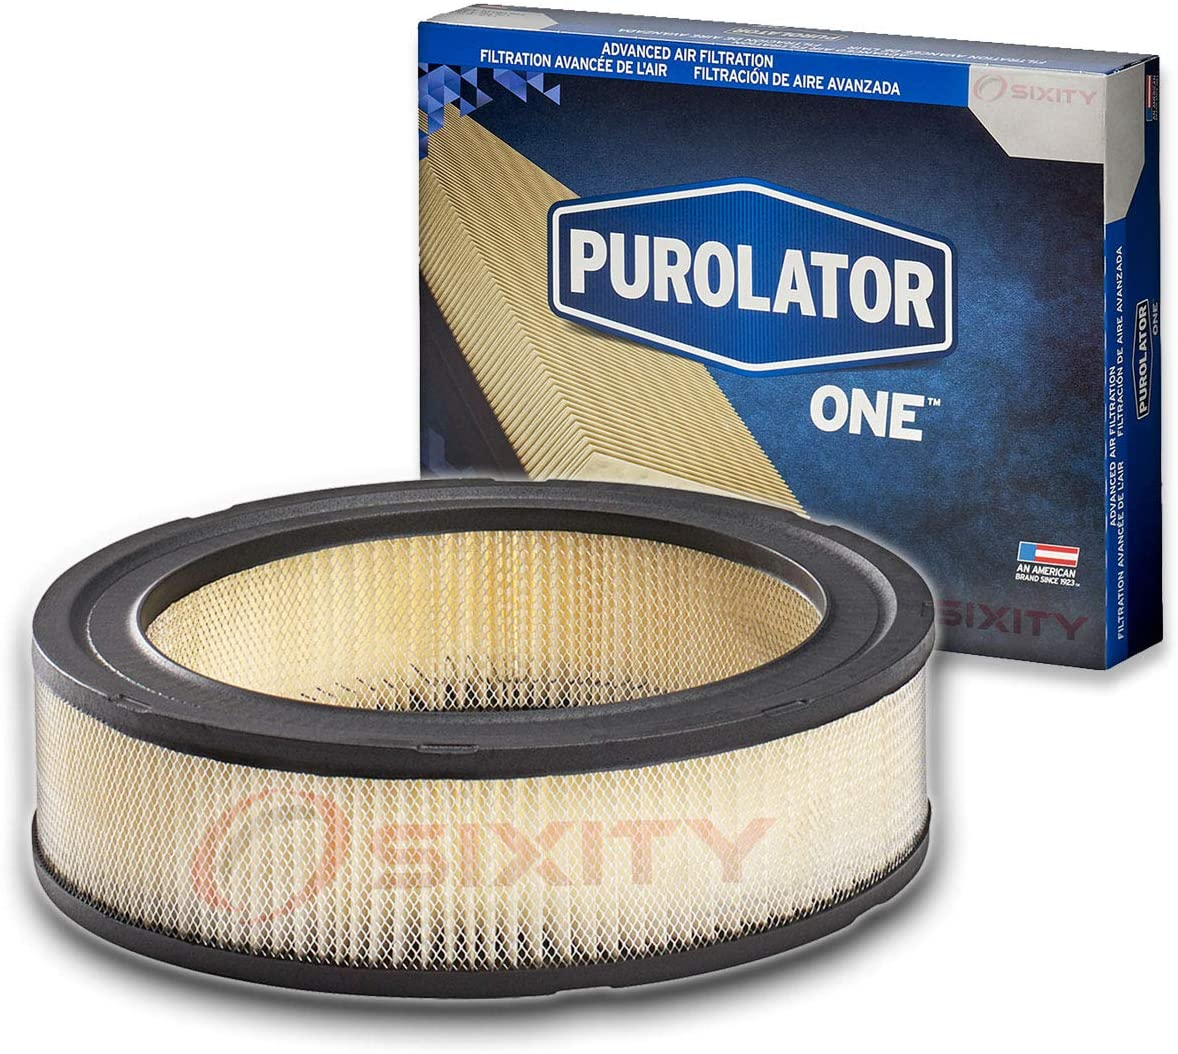 Purolator ONE Engine Air Filter for 1971-1974 American Motors Ambassador - Intake Flow Filters